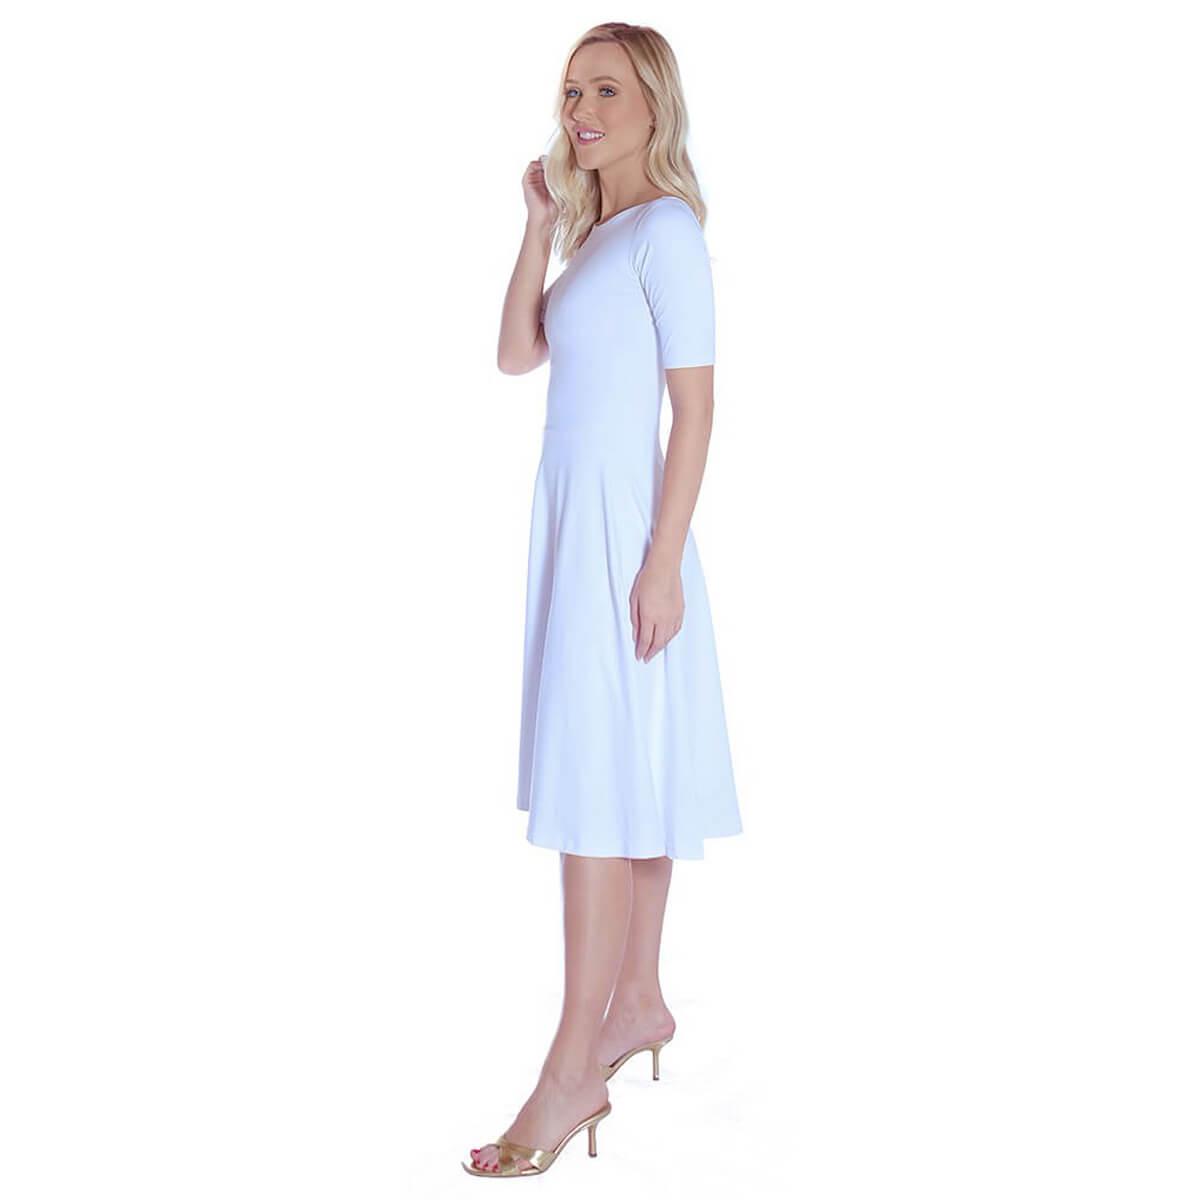 Vestido Branco FICALINDA Meia Manga Decote Canoa